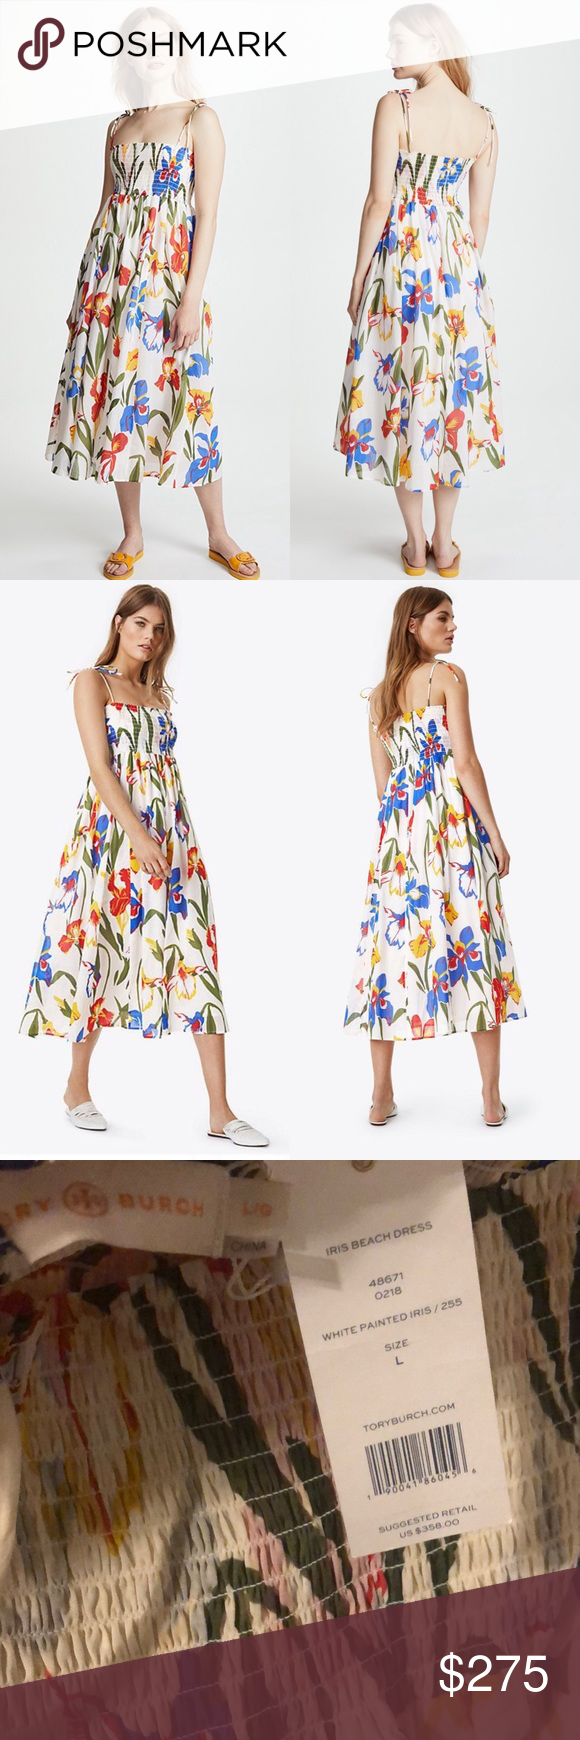 068f3715cd TORY BURCH | Convertible Smocked Iris Beach Dress TORY BURCH | Convertible  Smocked Floral Iris Beach